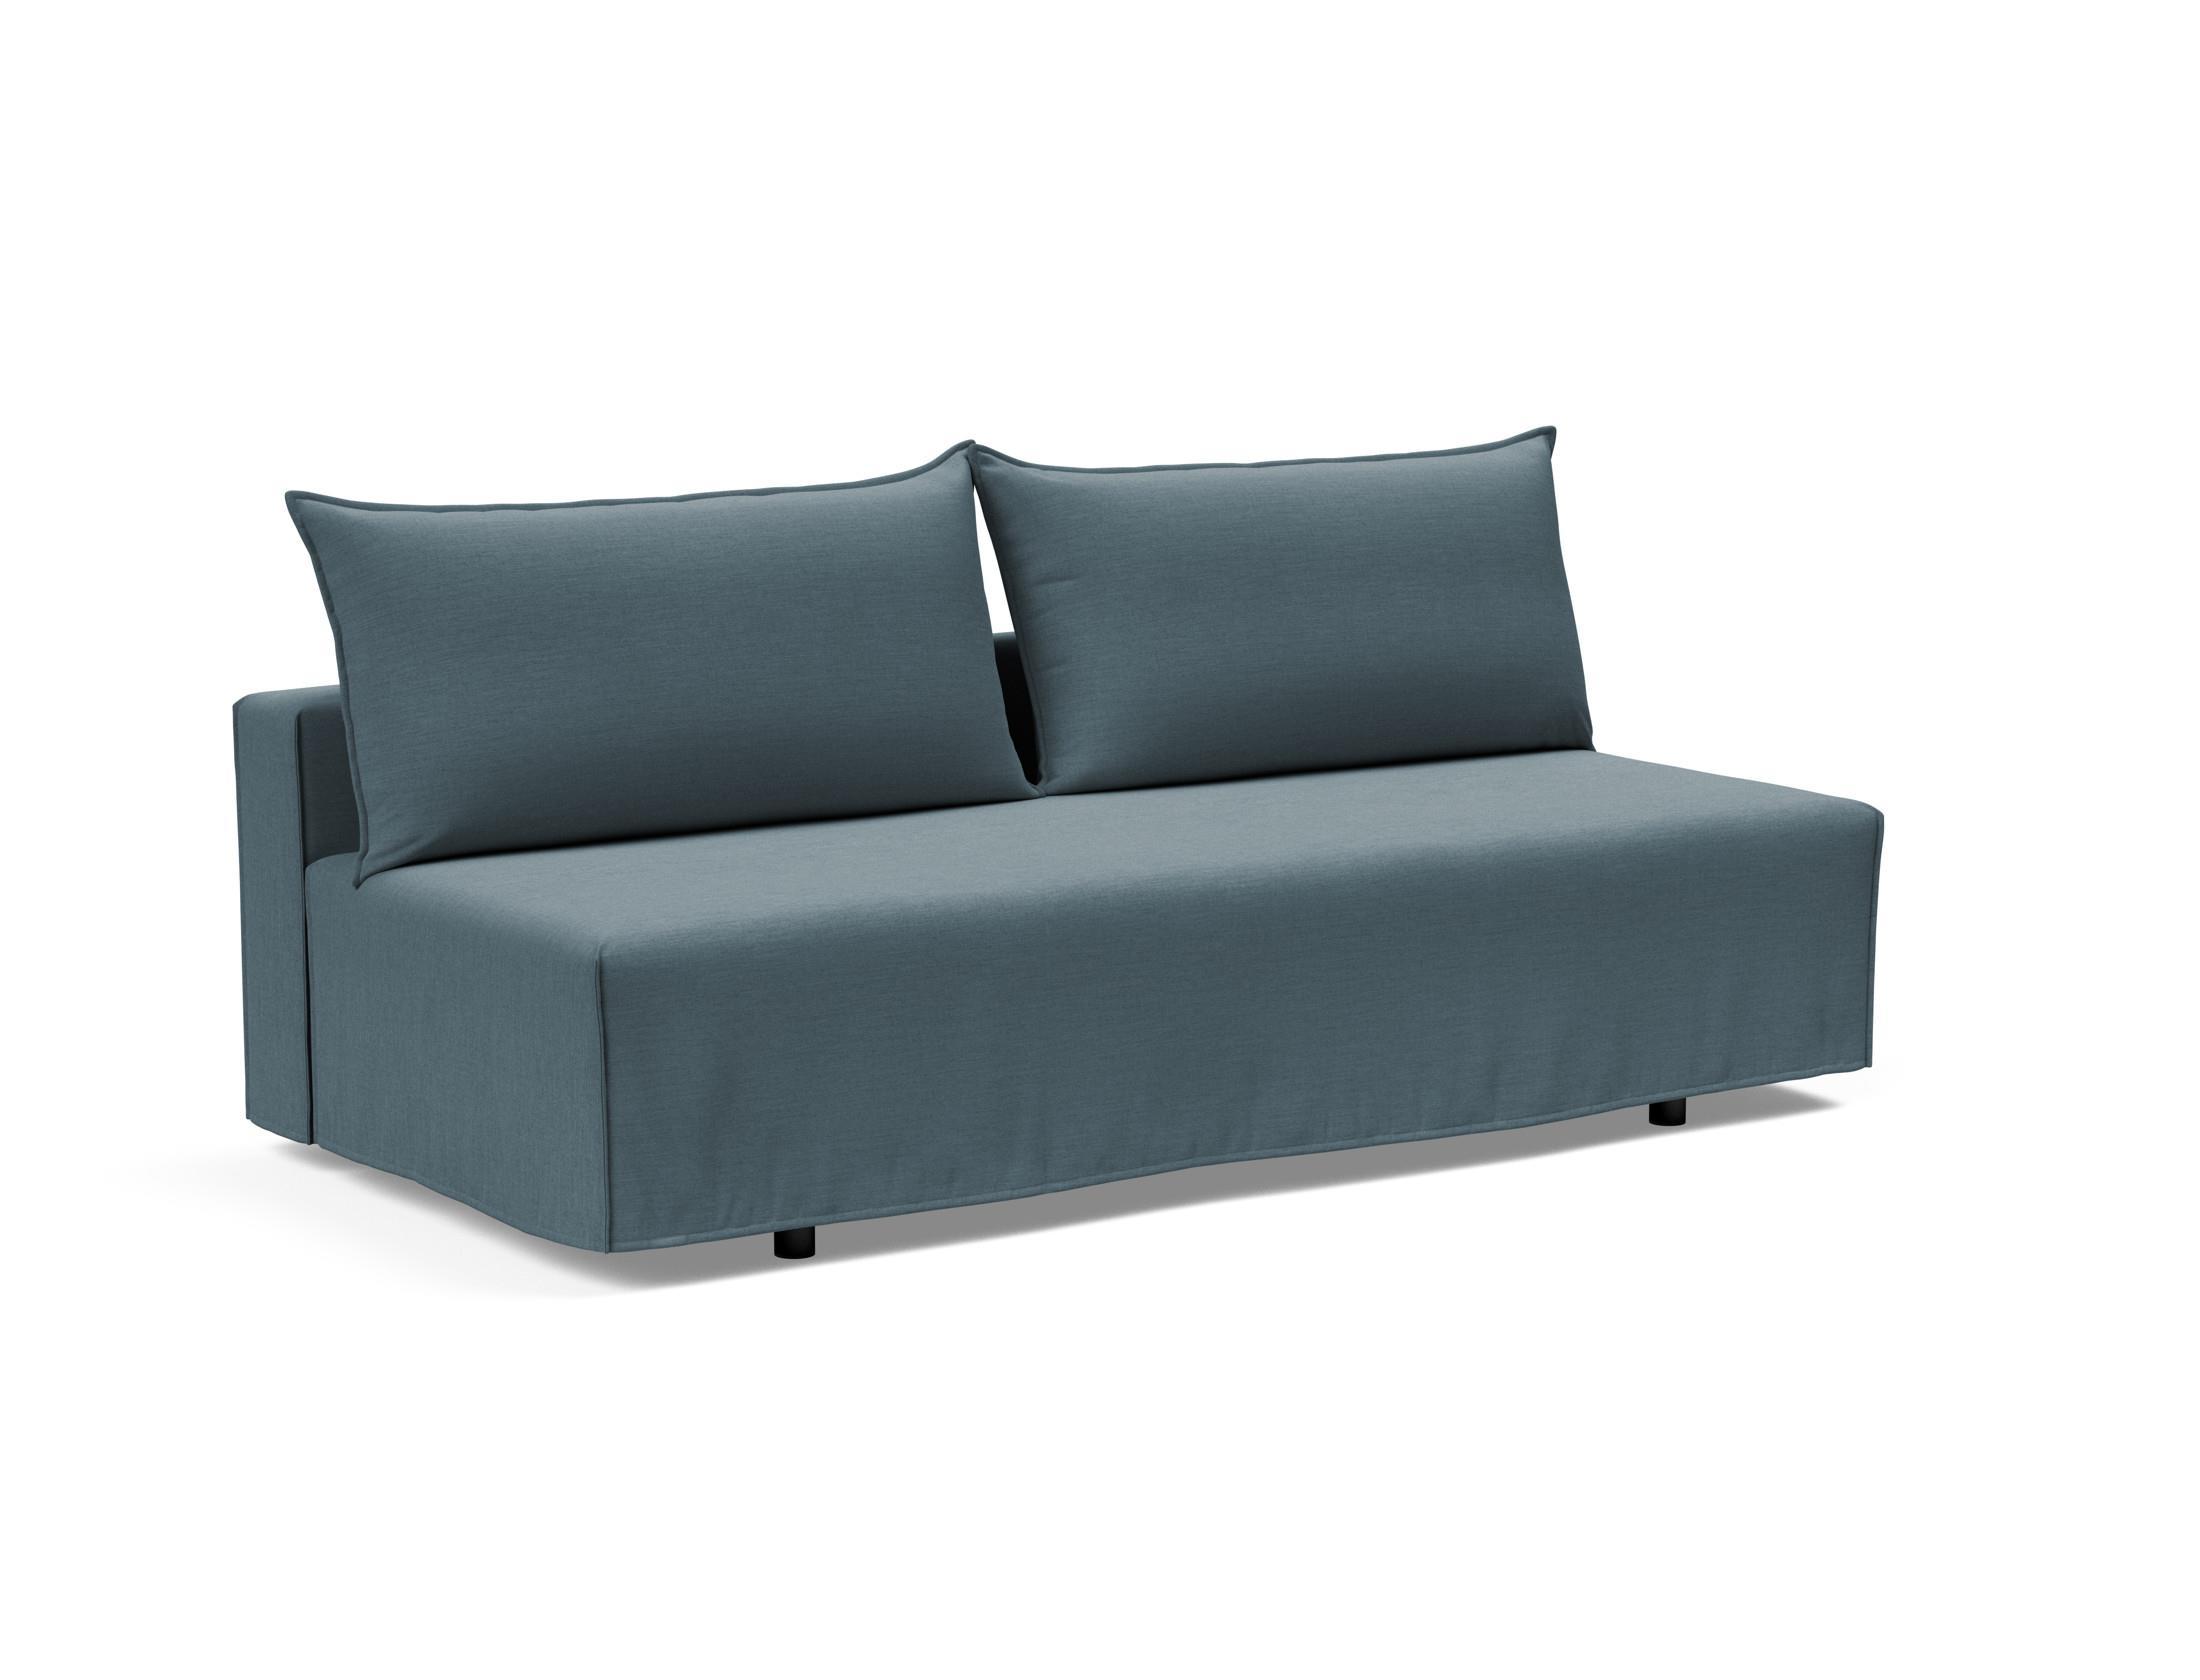 media/image/Revivus-Sofa-Bed-573-p2-web.jpg